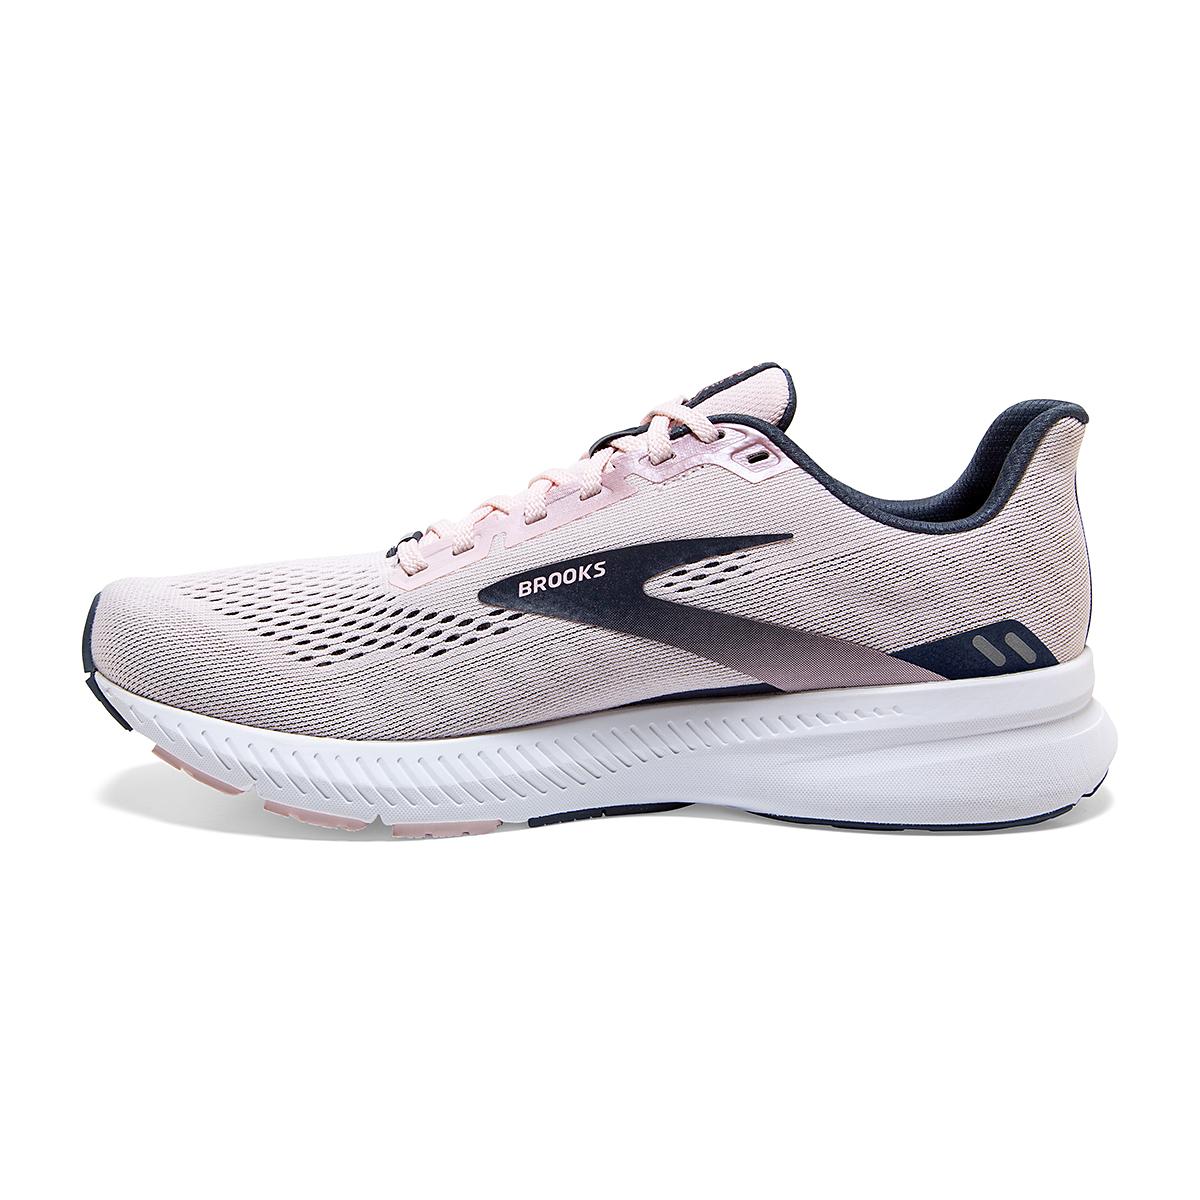 Women's Brooks Launch 8 Running Shoe - Color: Primrose/Ombre/Metallic - Size: 5 - Width: Regular, Primrose/Ombre/Metallic, large, image 4